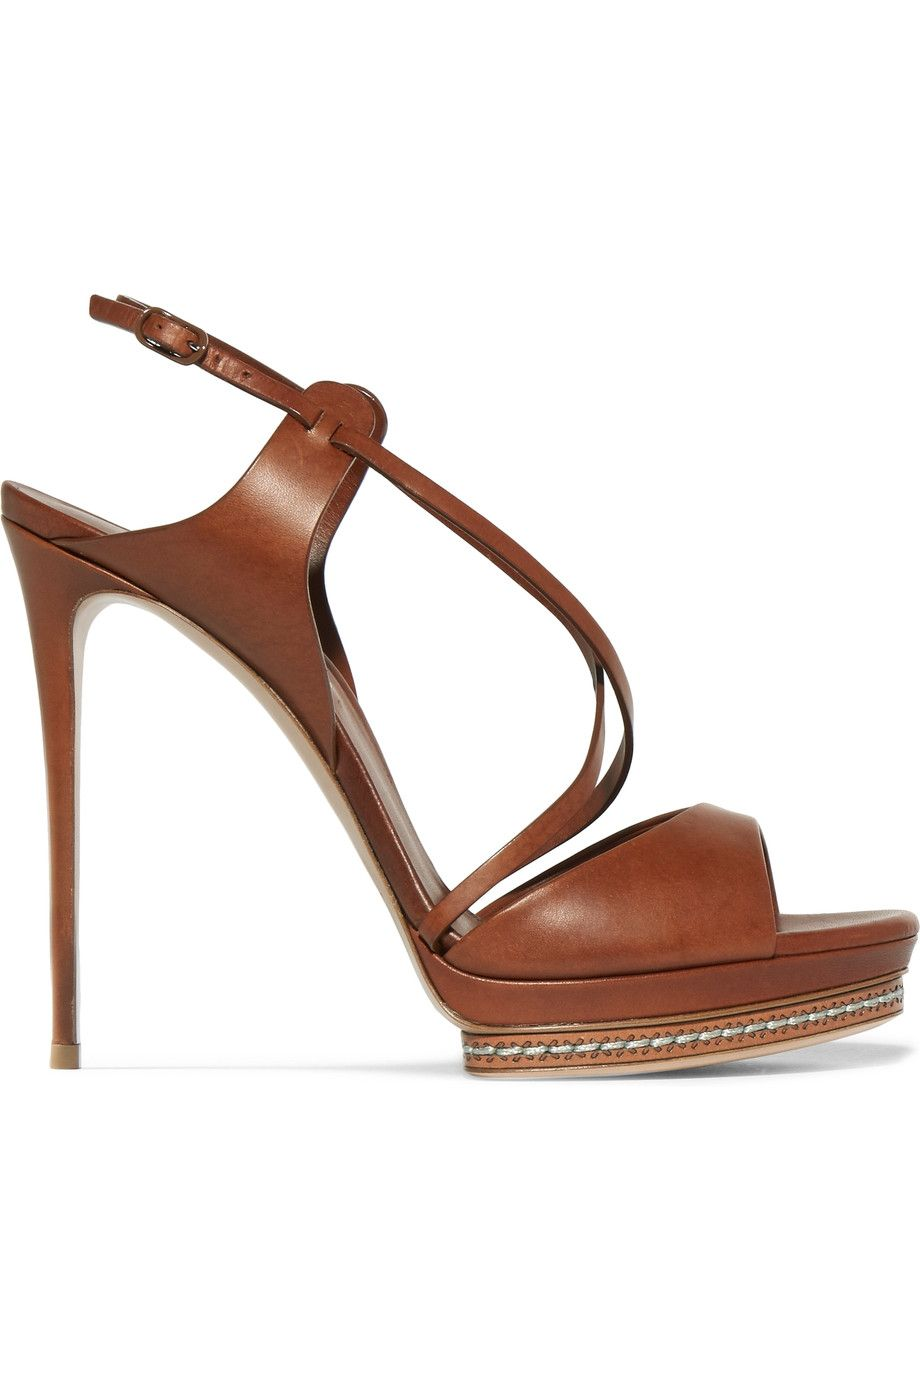 CASADEI . #casadei #shoes #sandals